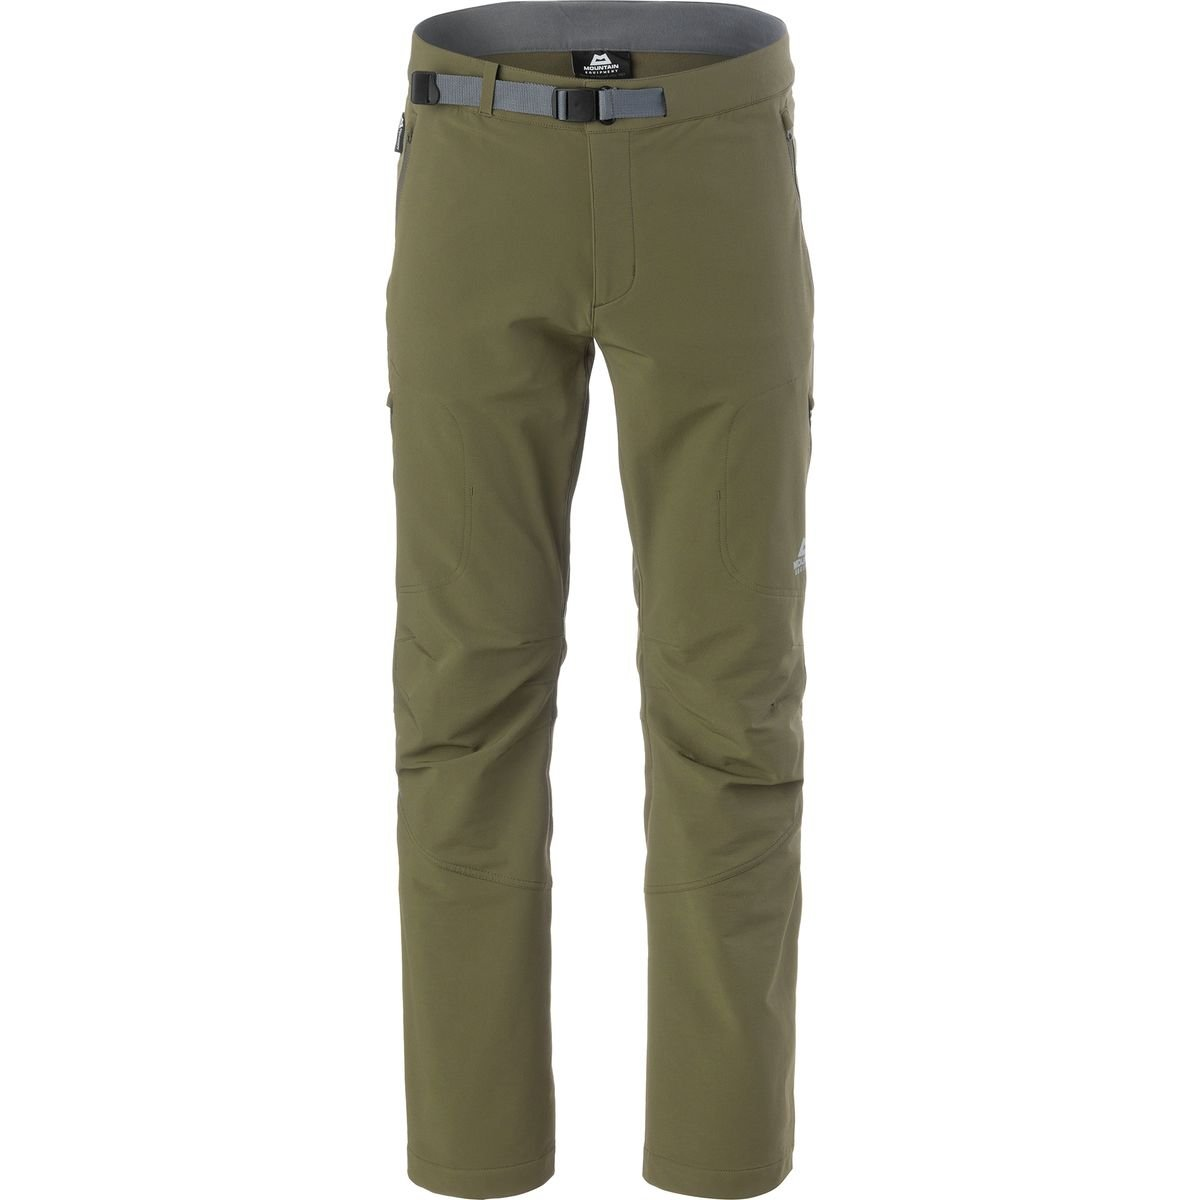 Mountain Equipment Ibex Short Length Walking Pants